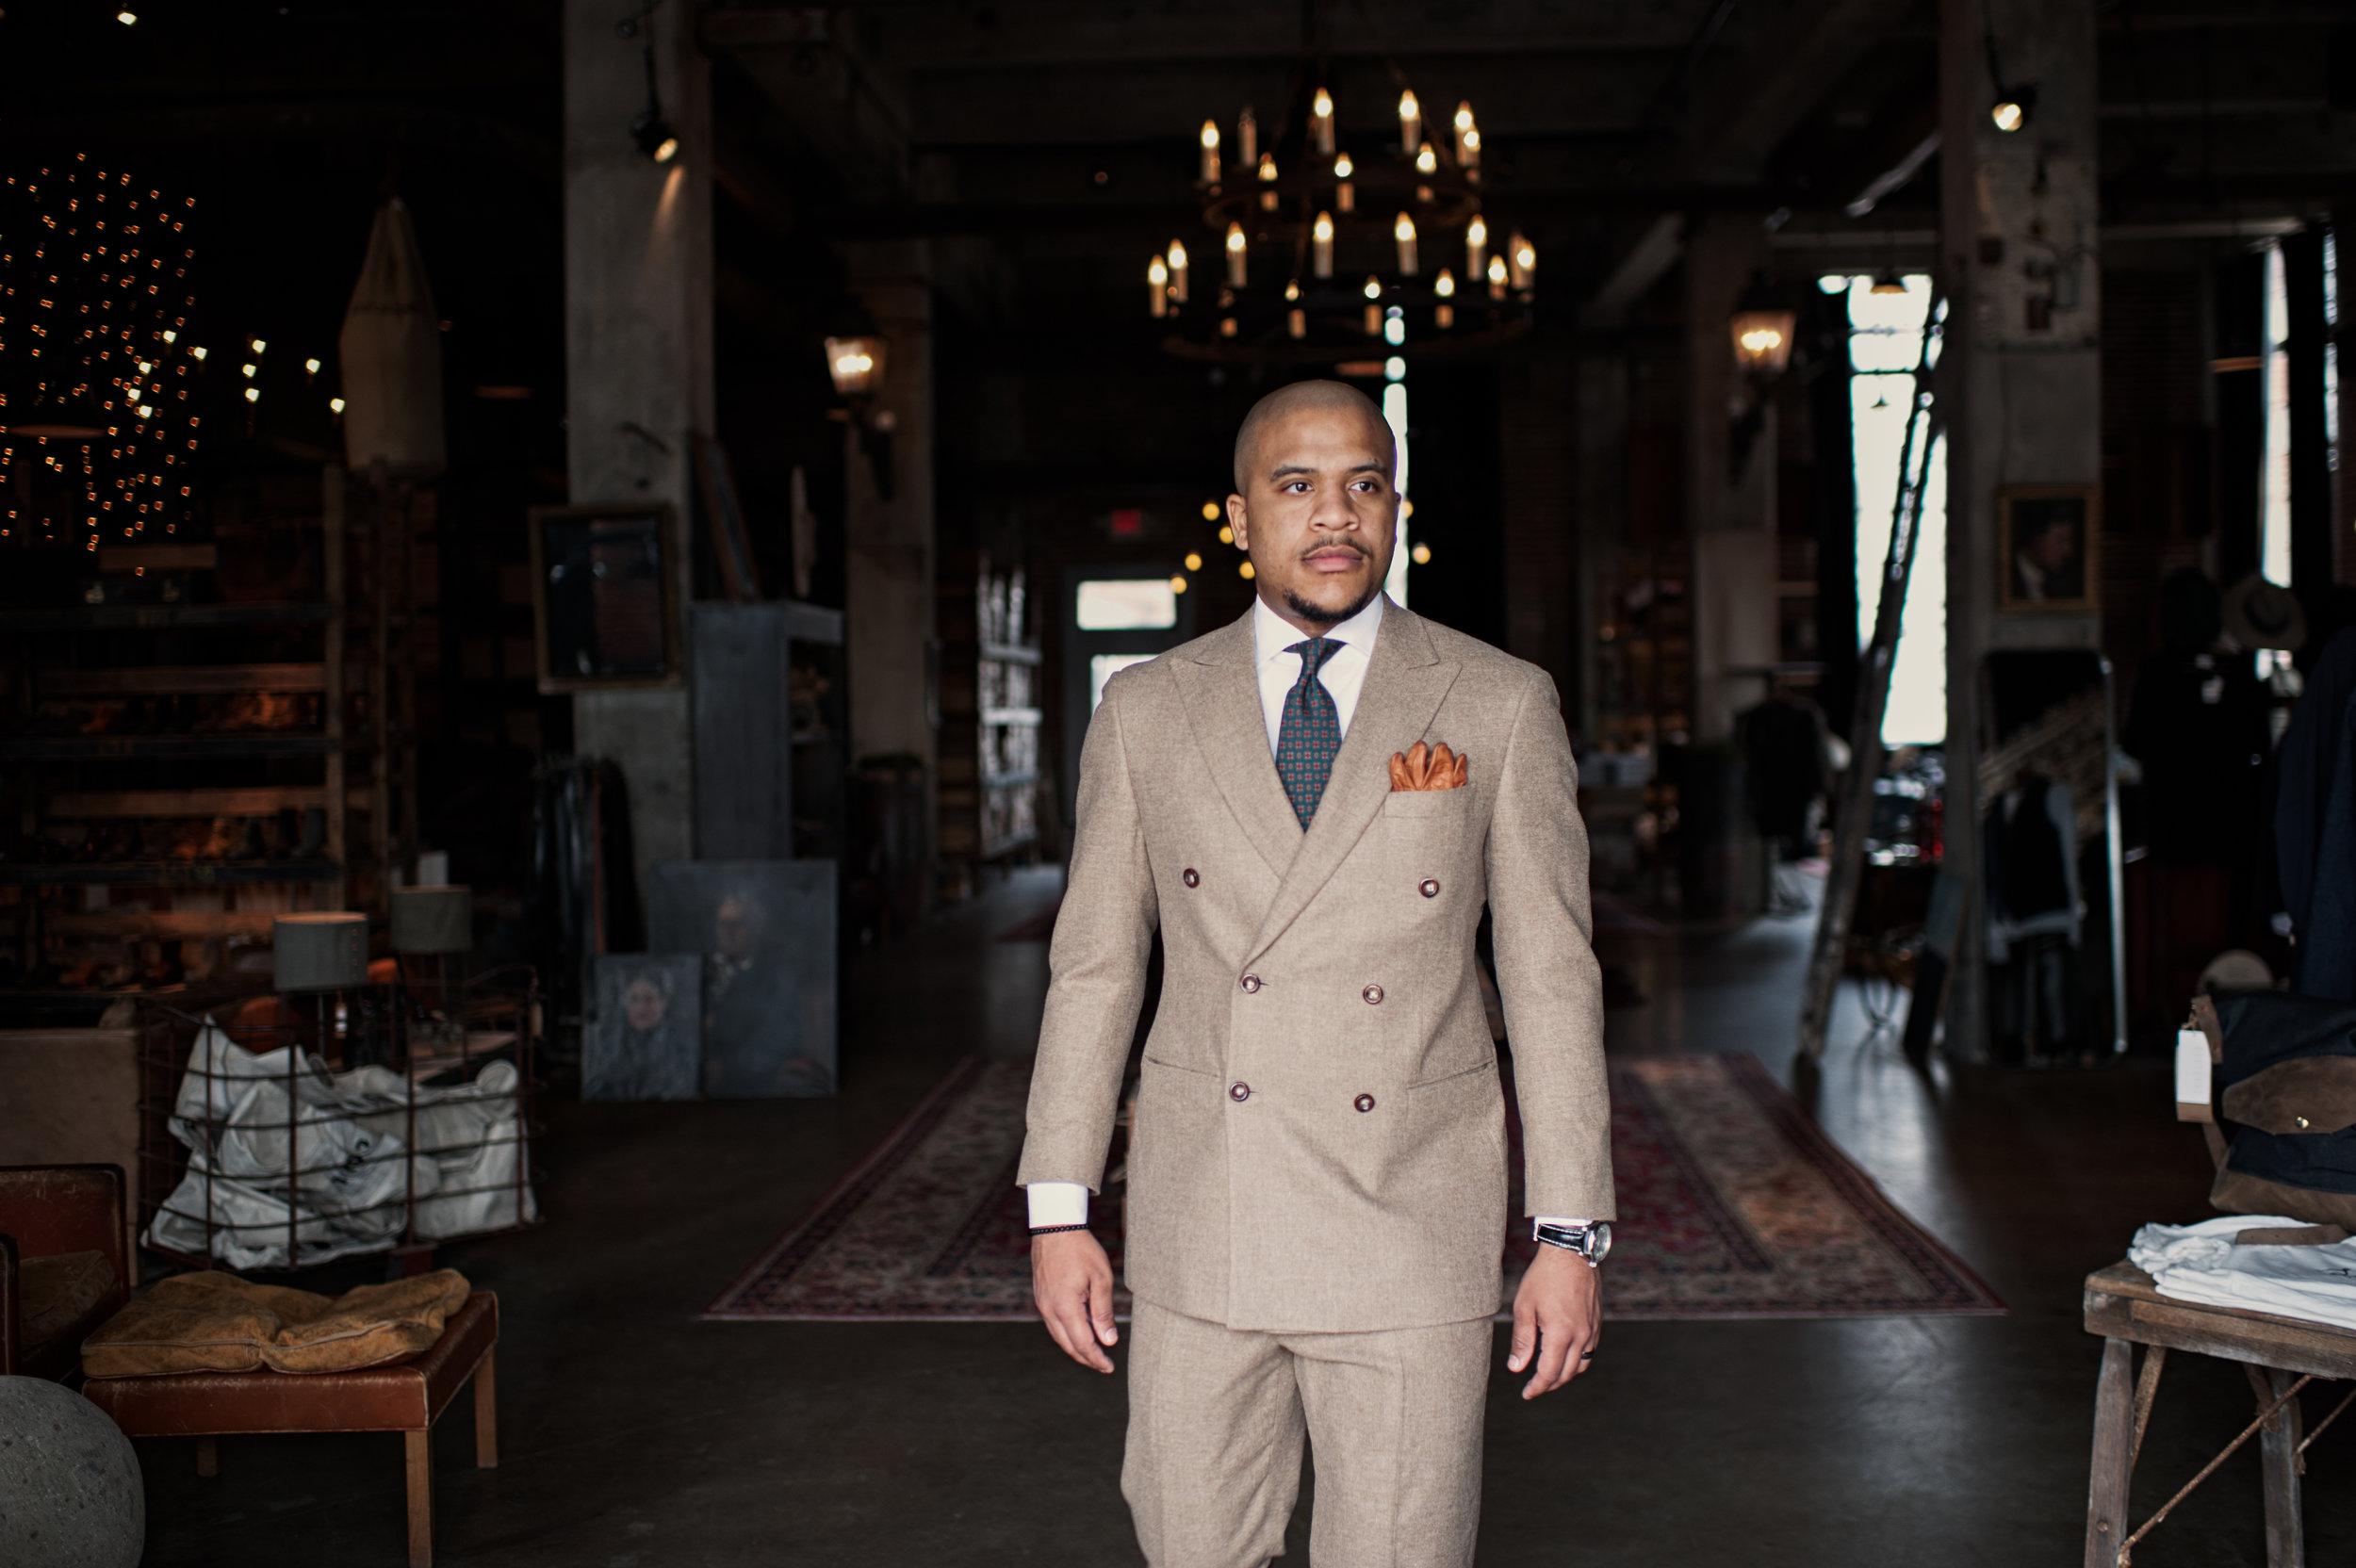 Stitch-It & Co. Custom suits